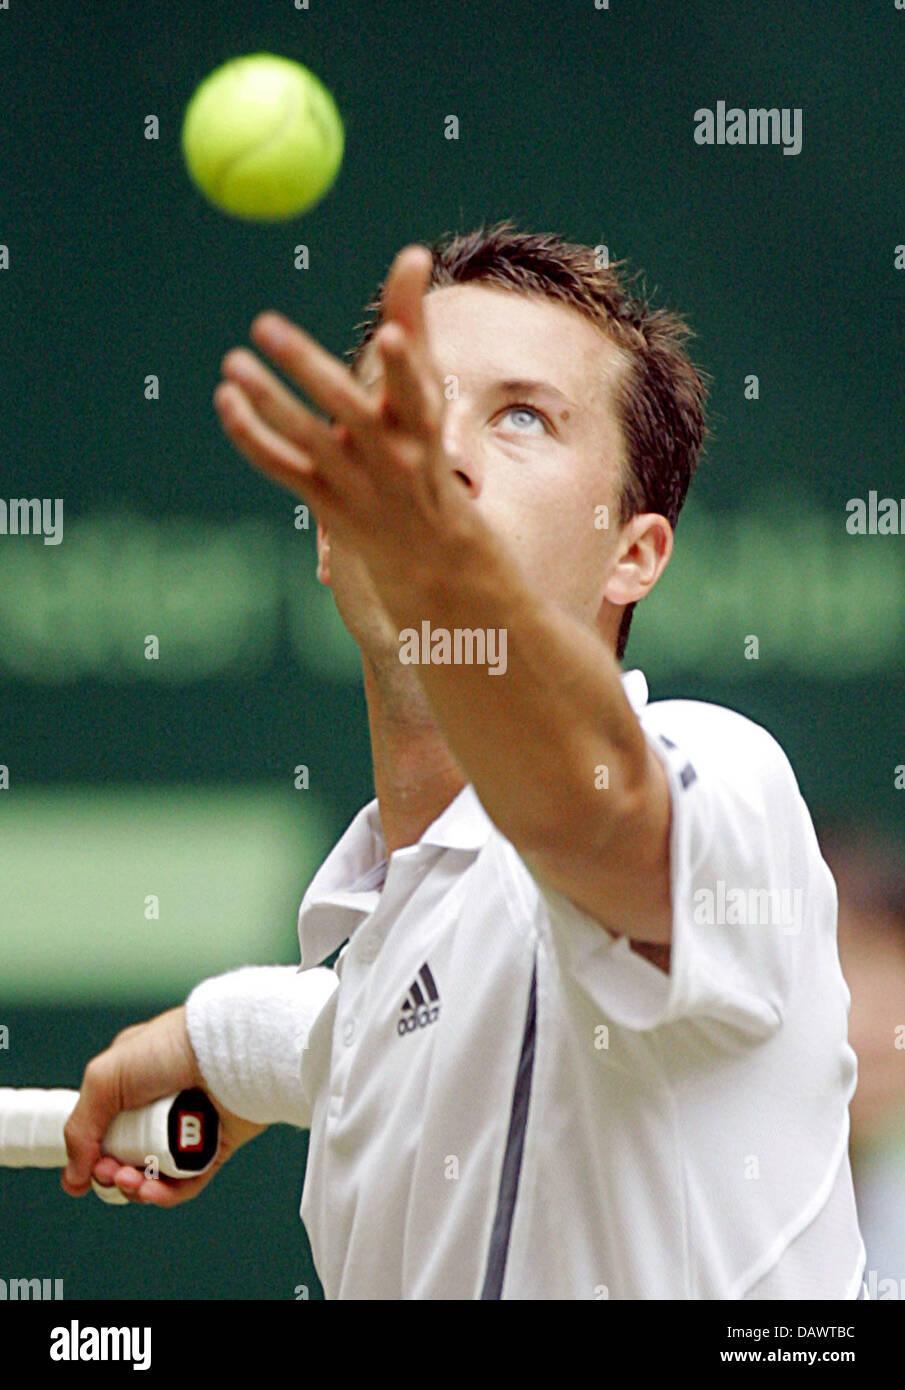 German tennis pro Philipp Kohlschreiber serves a ball during his quarter-finals match against seeded US James Blake Stock Photo